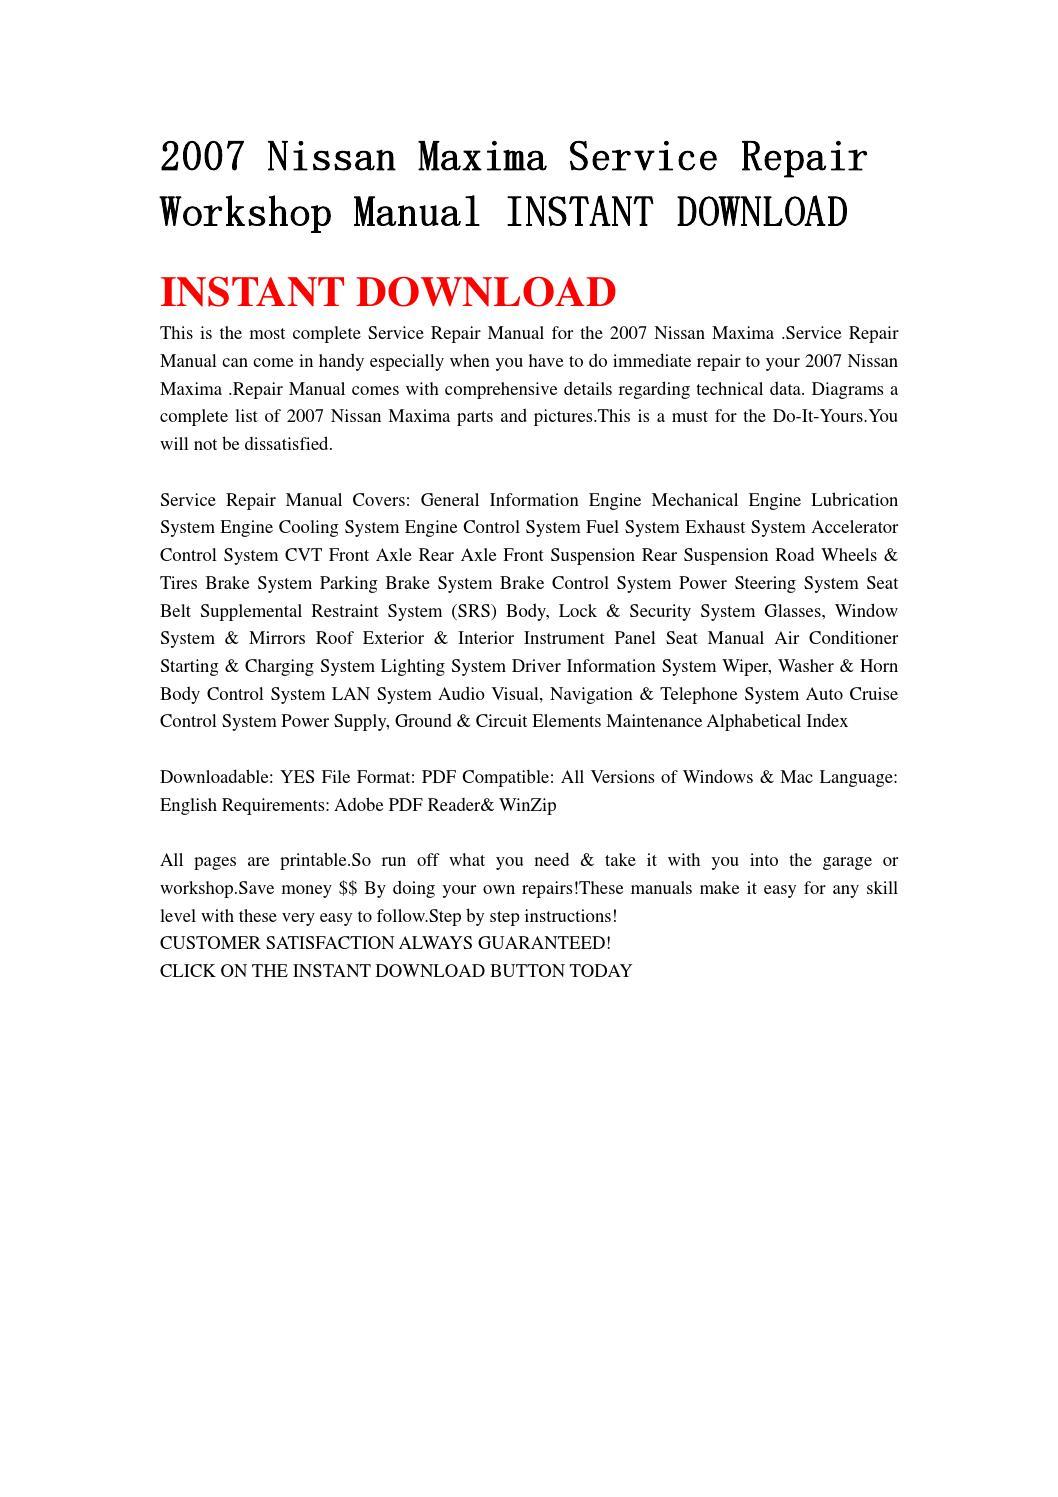 2007 nissan maxima repair manual